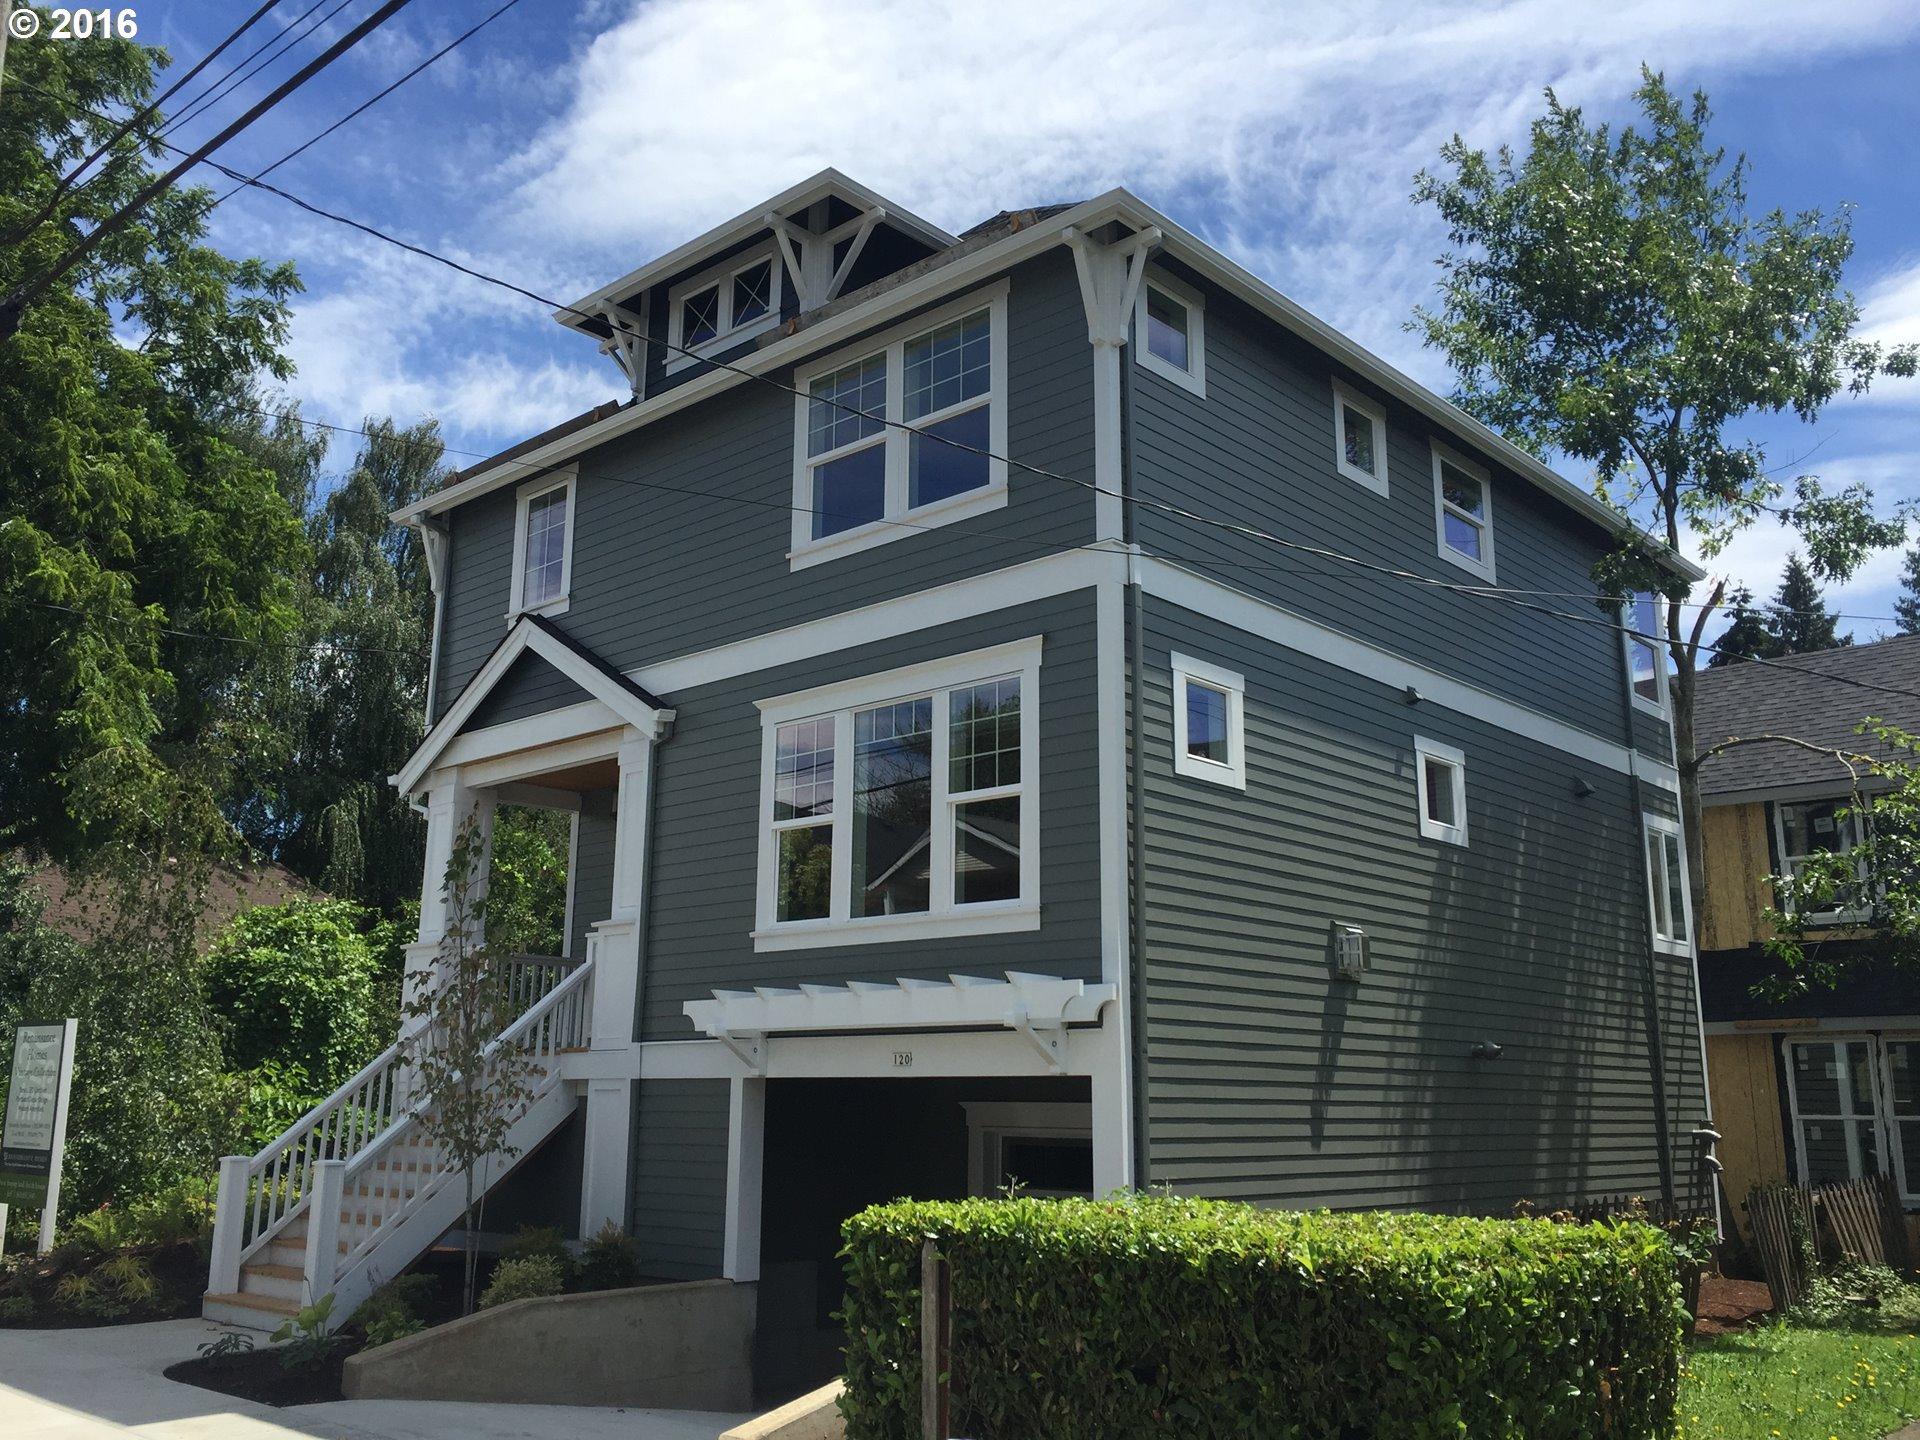 120 NE SACRAMENTO ST, Portland OR 97212